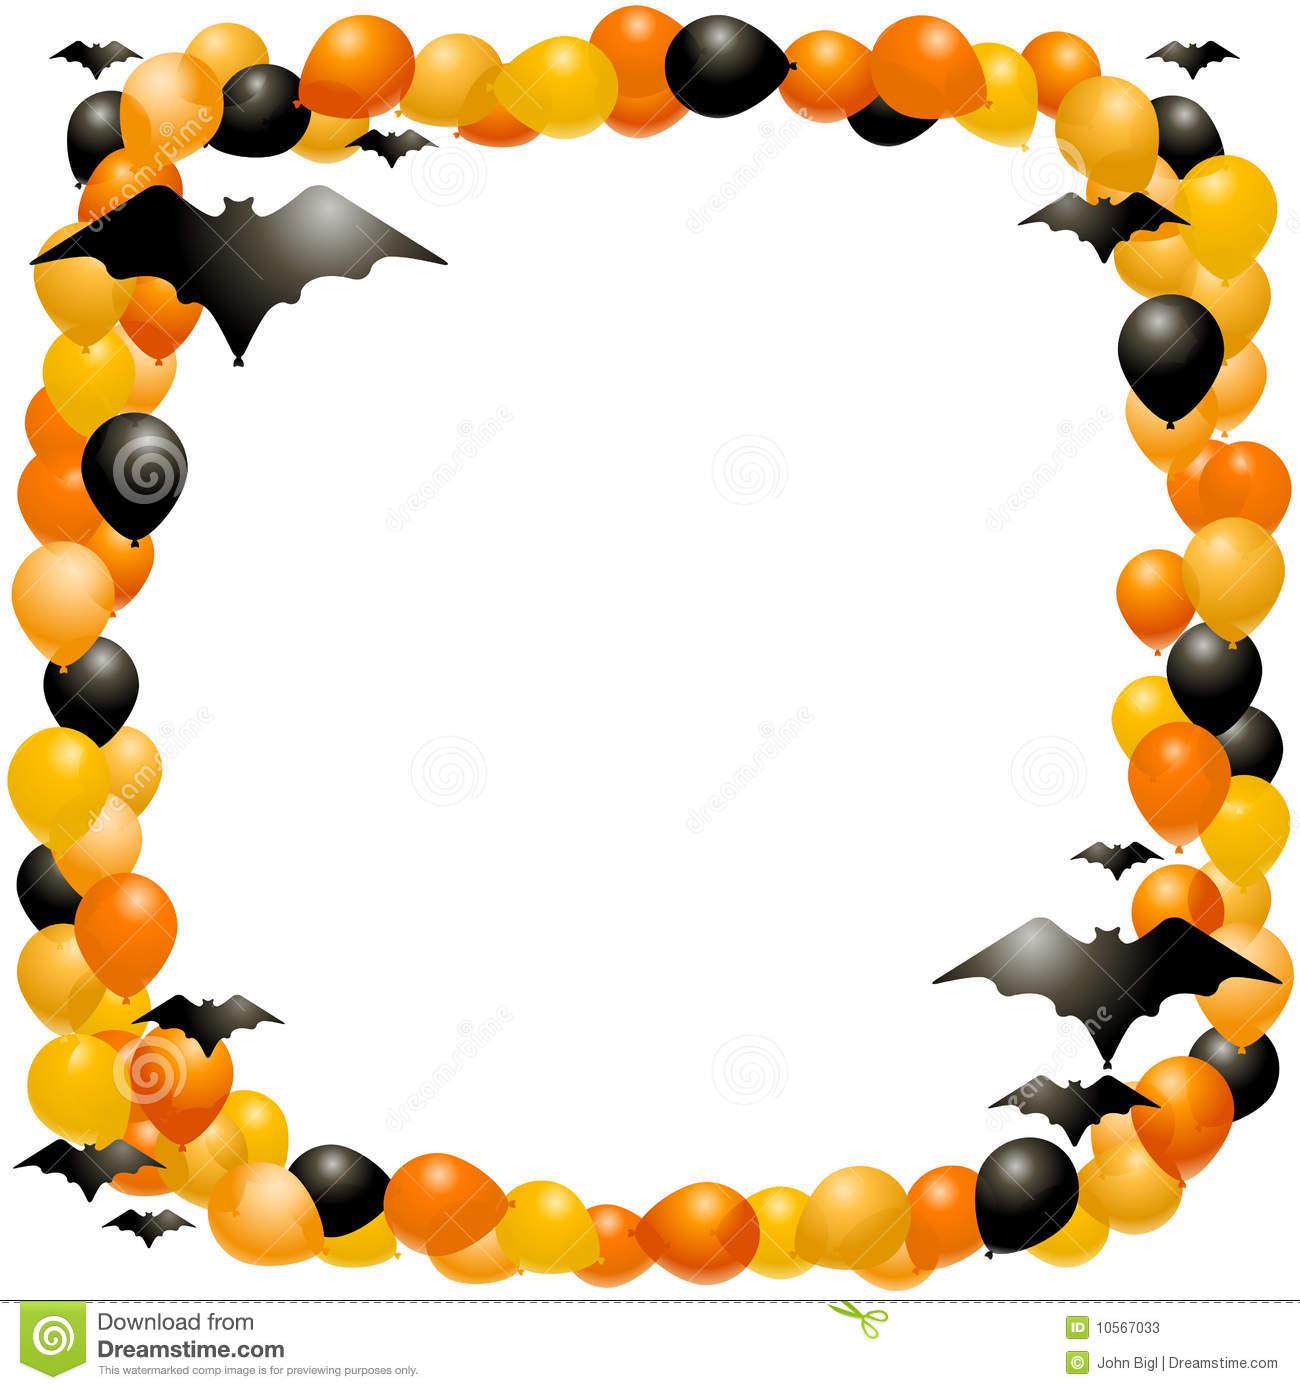 Halloween Clip Art Borders .-Halloween Clip Art Borders .-12